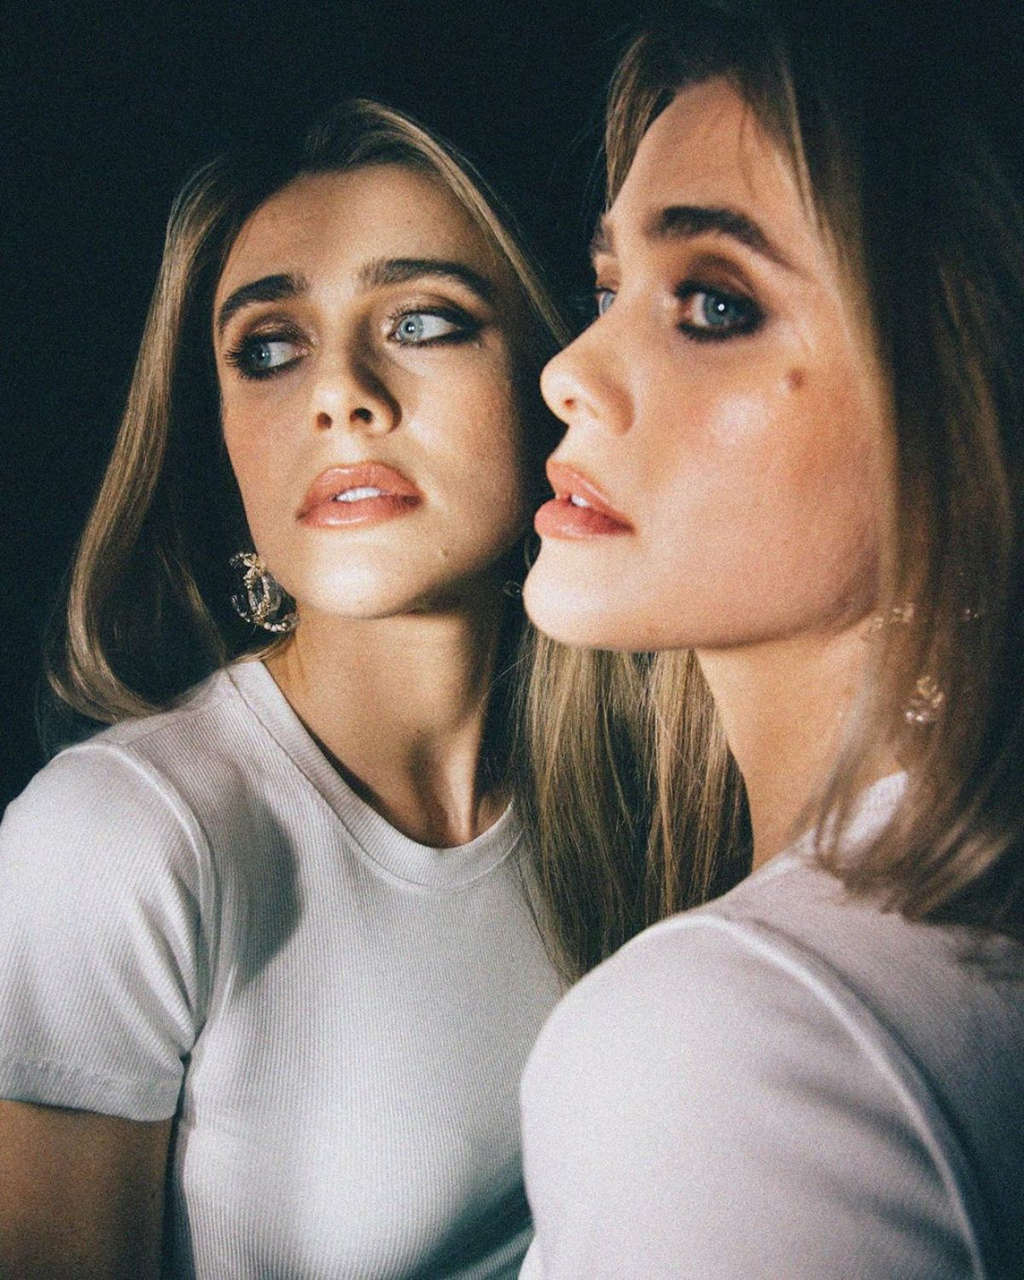 Melissa Roxburgh For We Love Coco Chanel Makeup 2020 Photoshoot